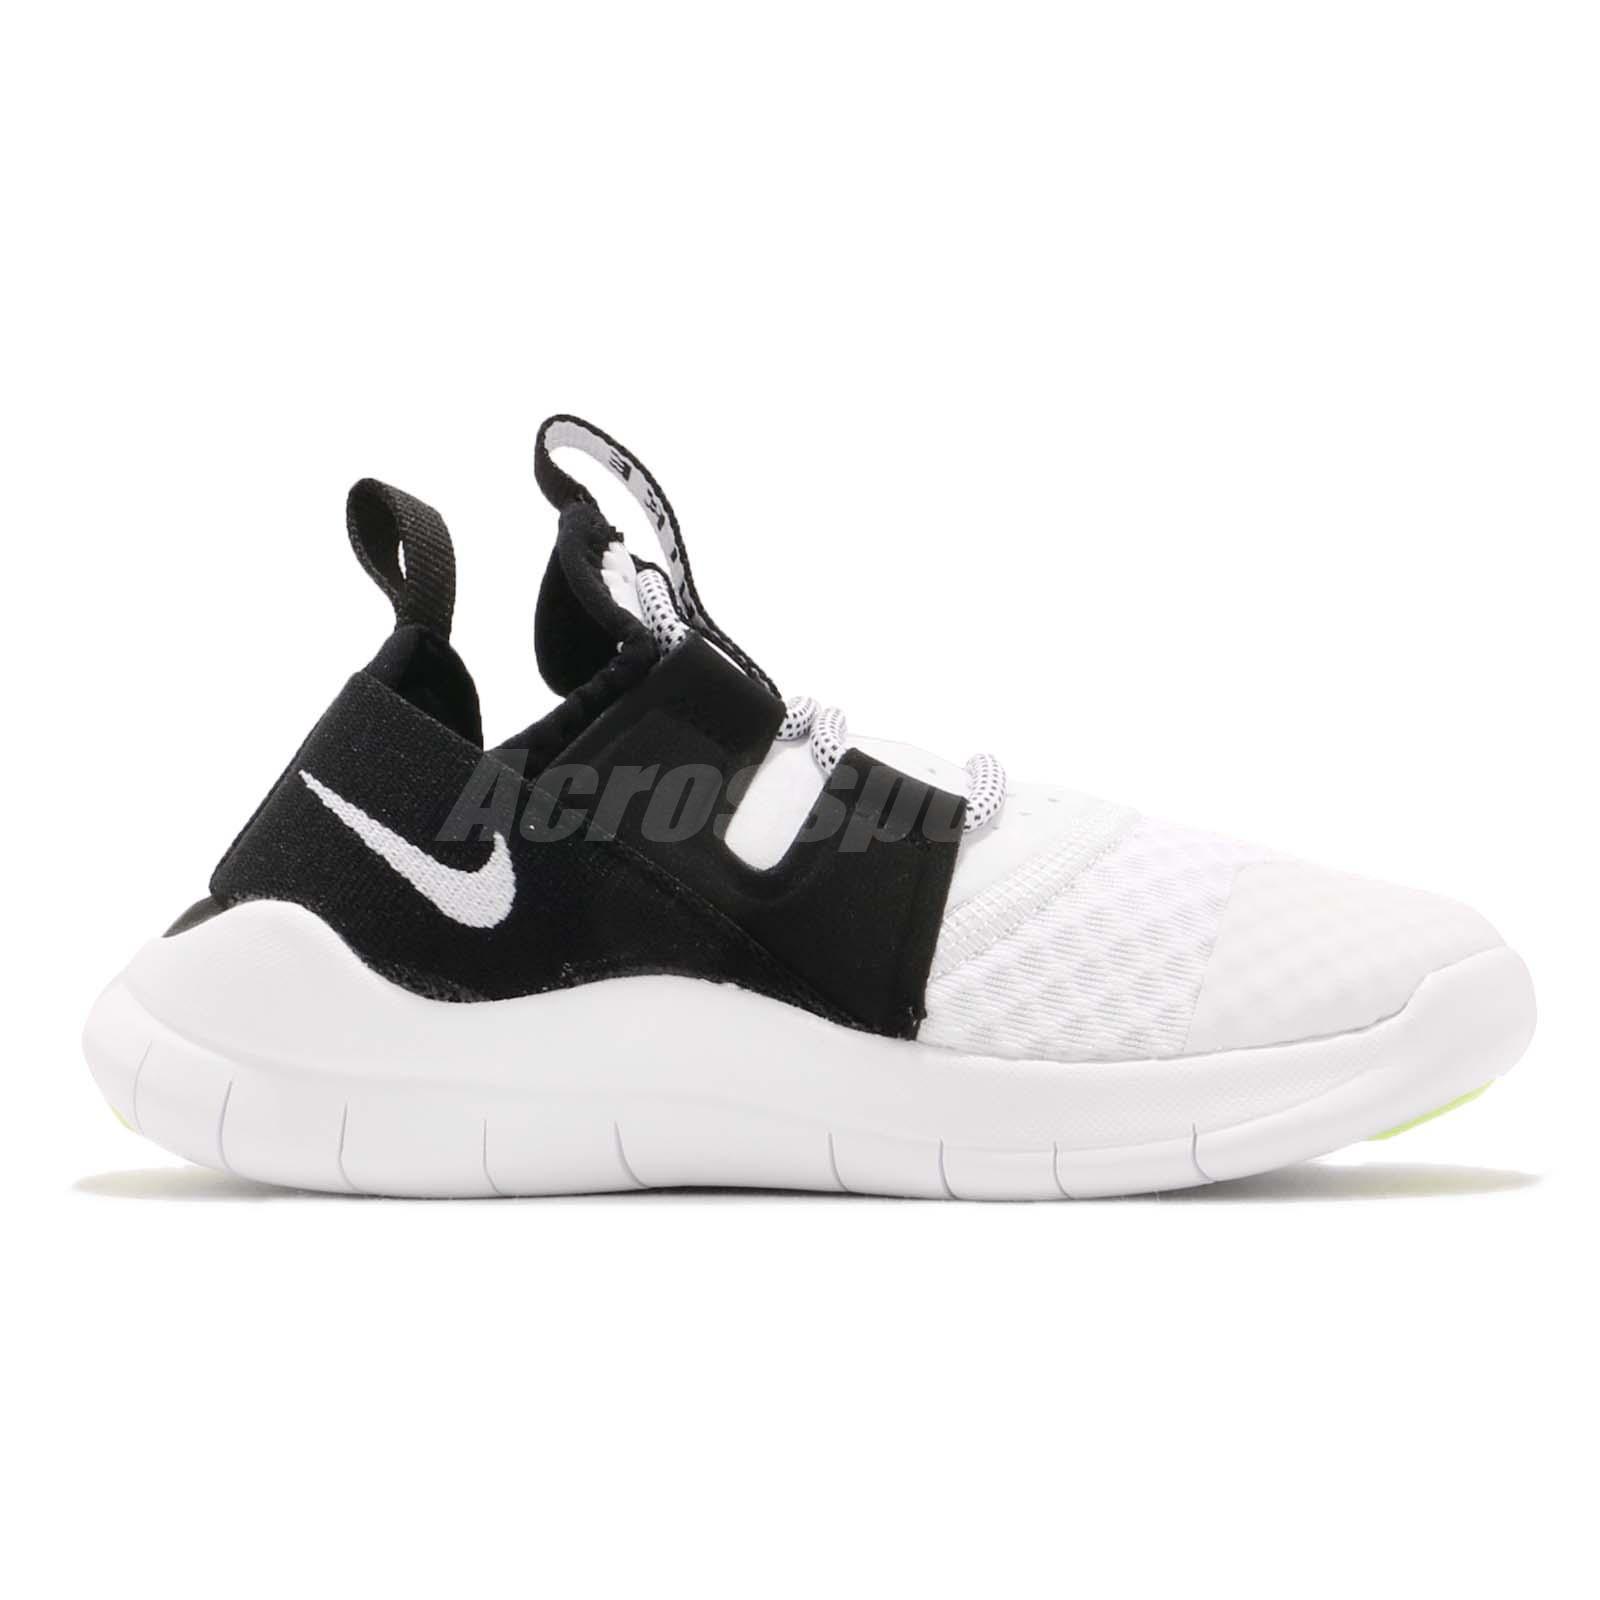 19b43e000d5b9 Nike Free RN CMTR 2018 PS White Black Preschool Kids Running Shoes ...